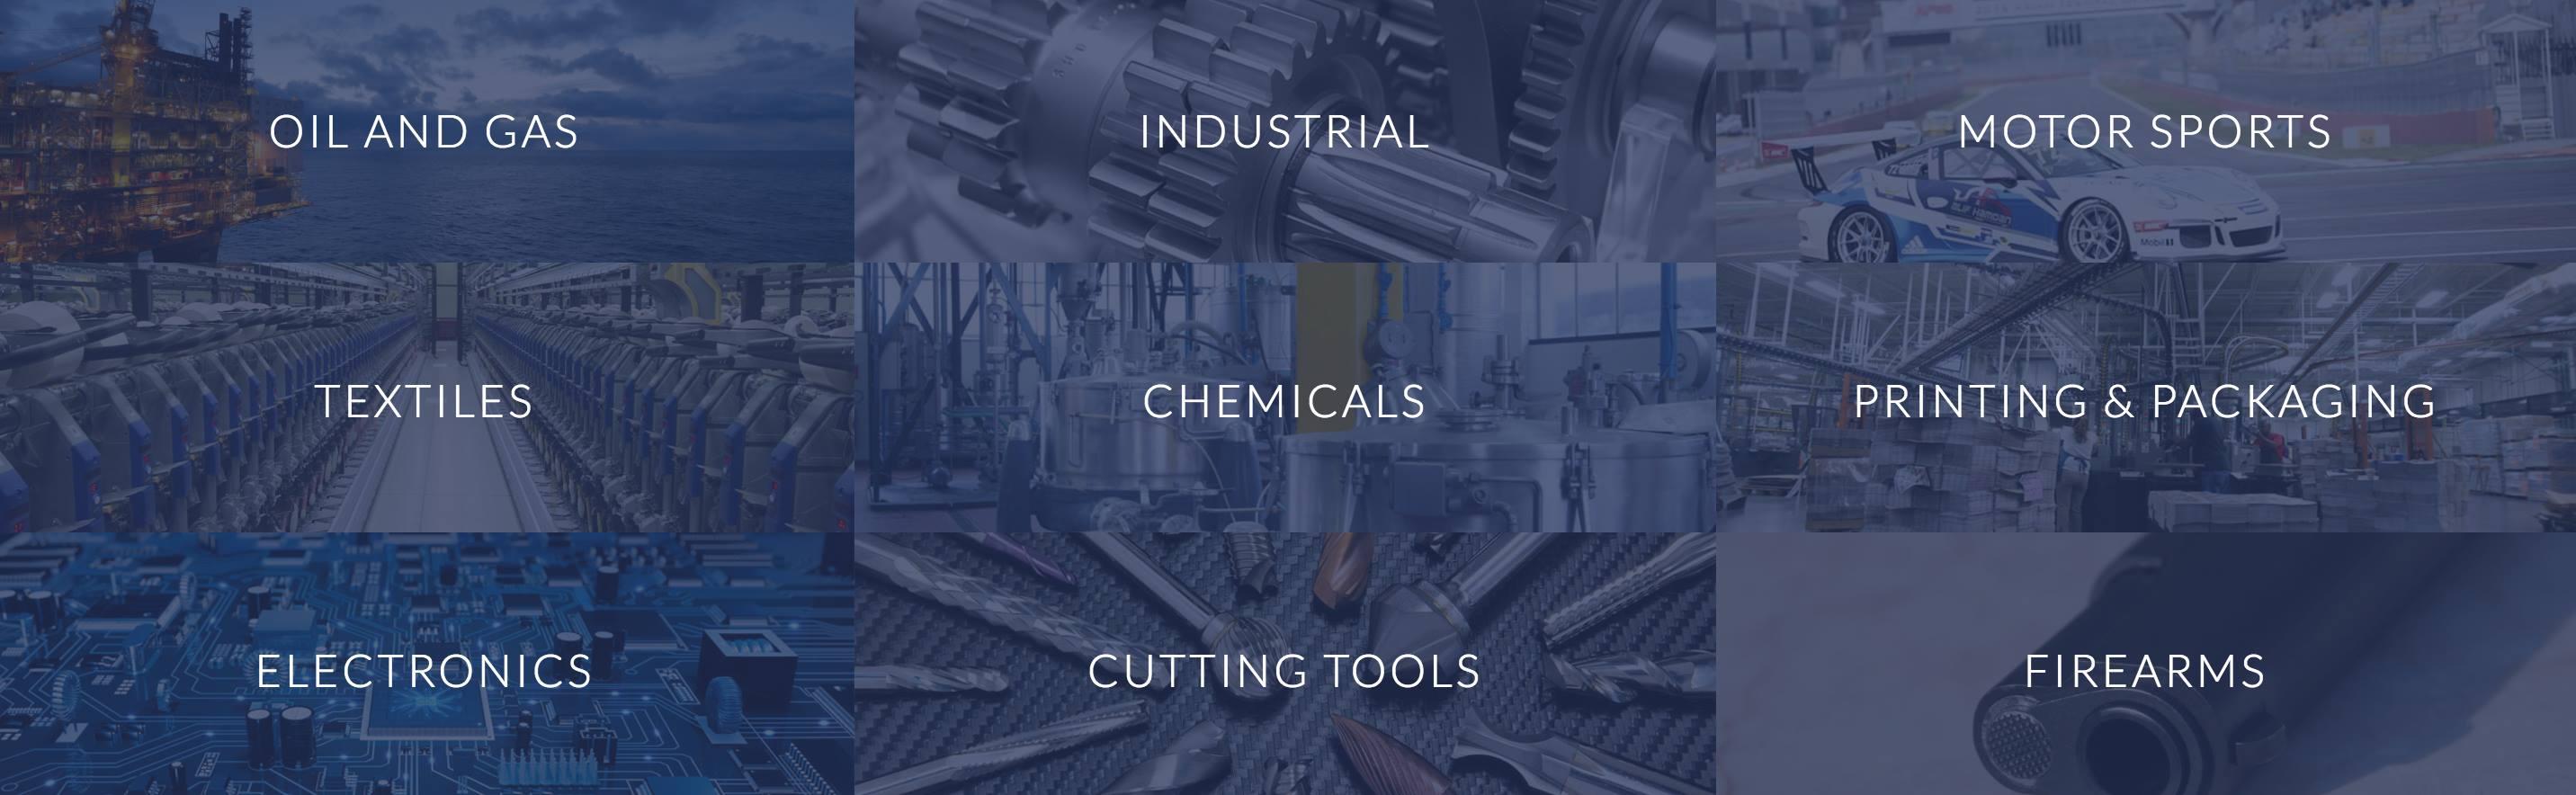 industrial hard carbon applications.jpg